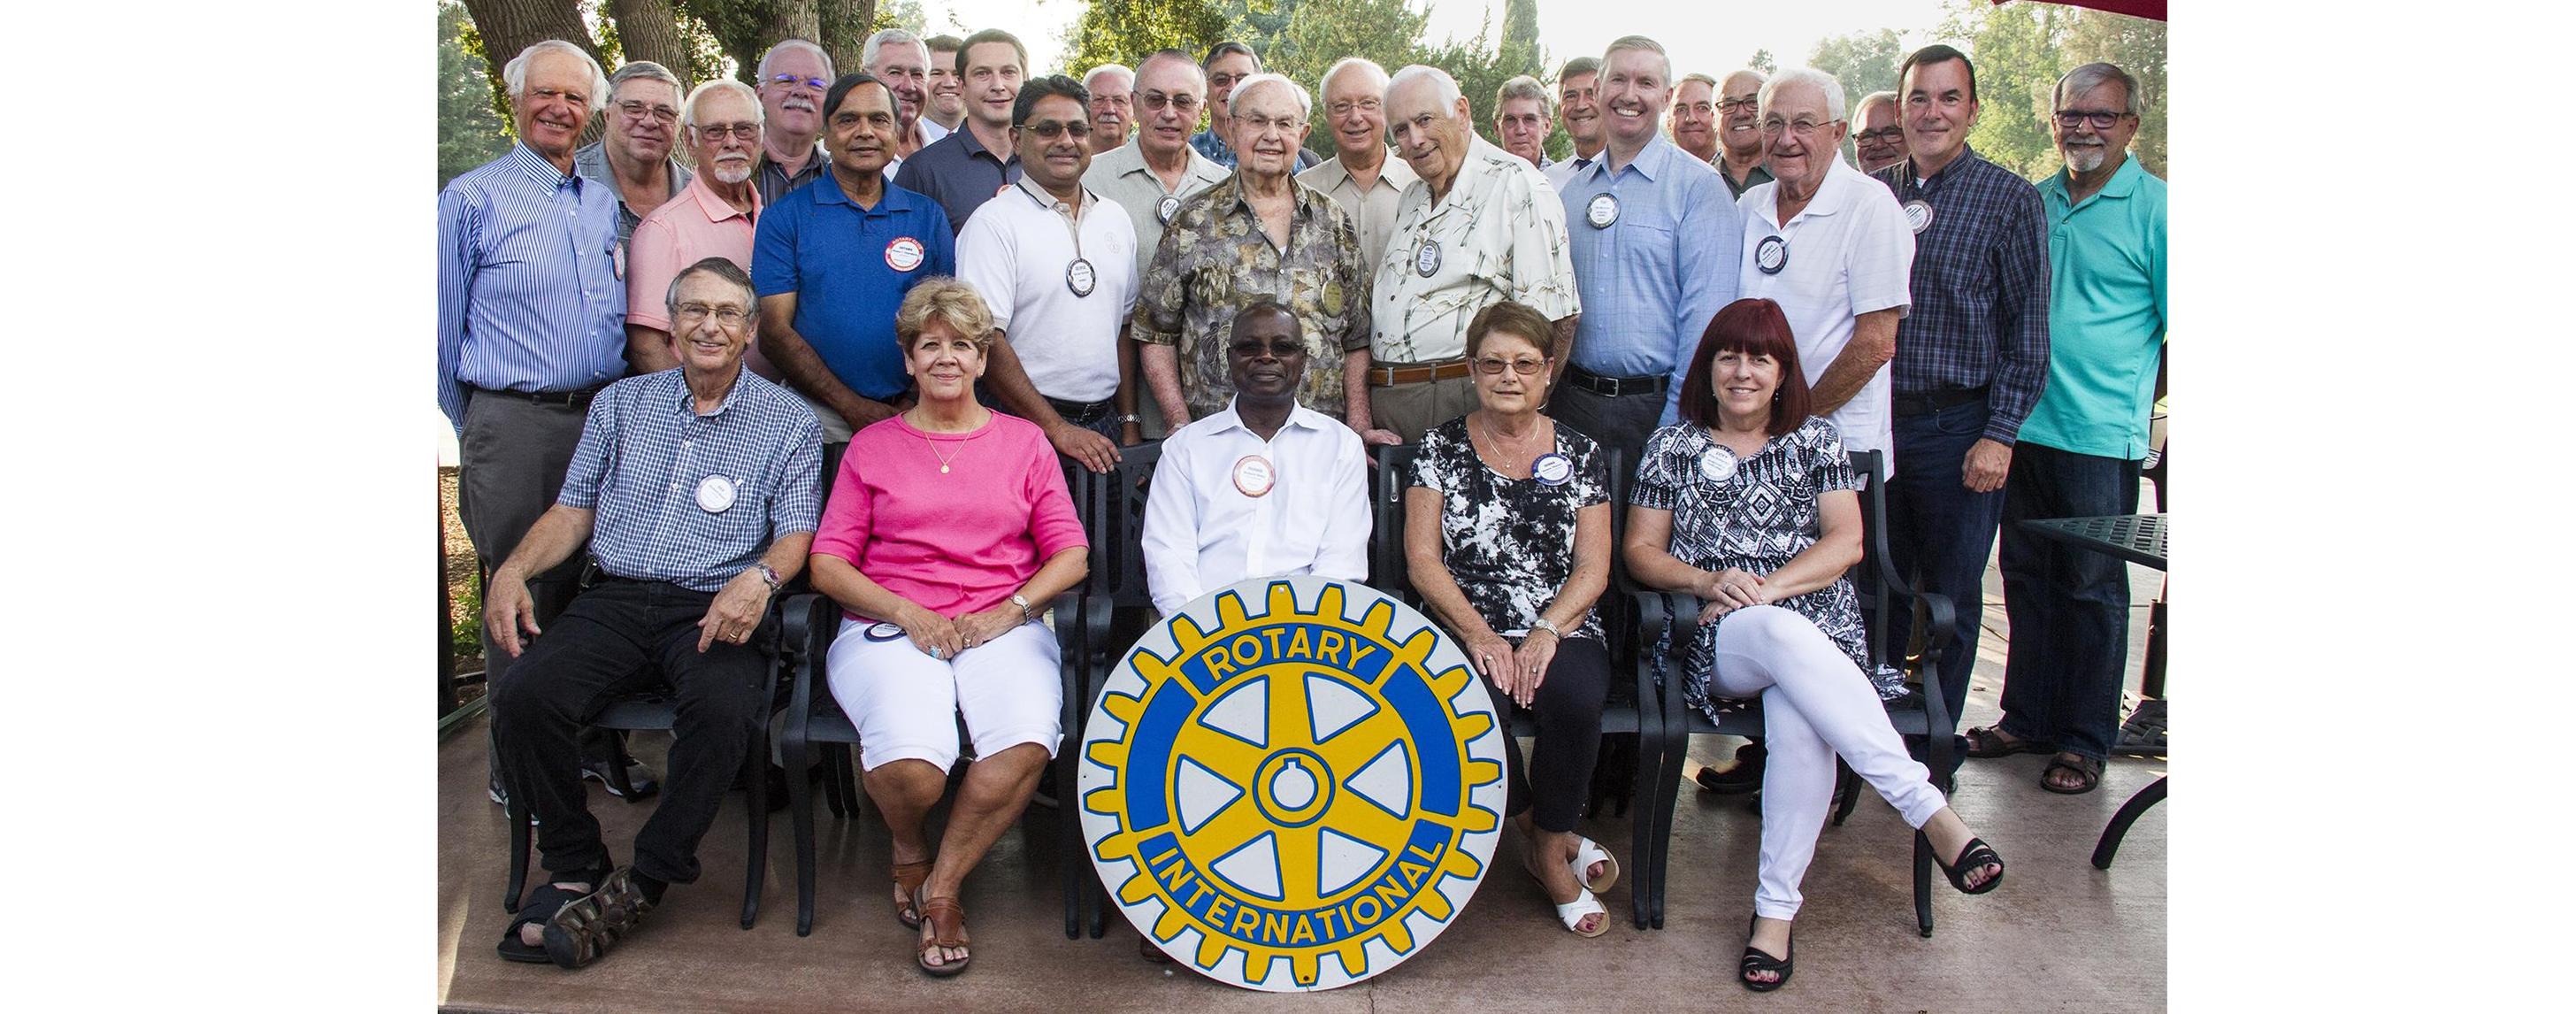 Photo of the Carmichael Rotary Club